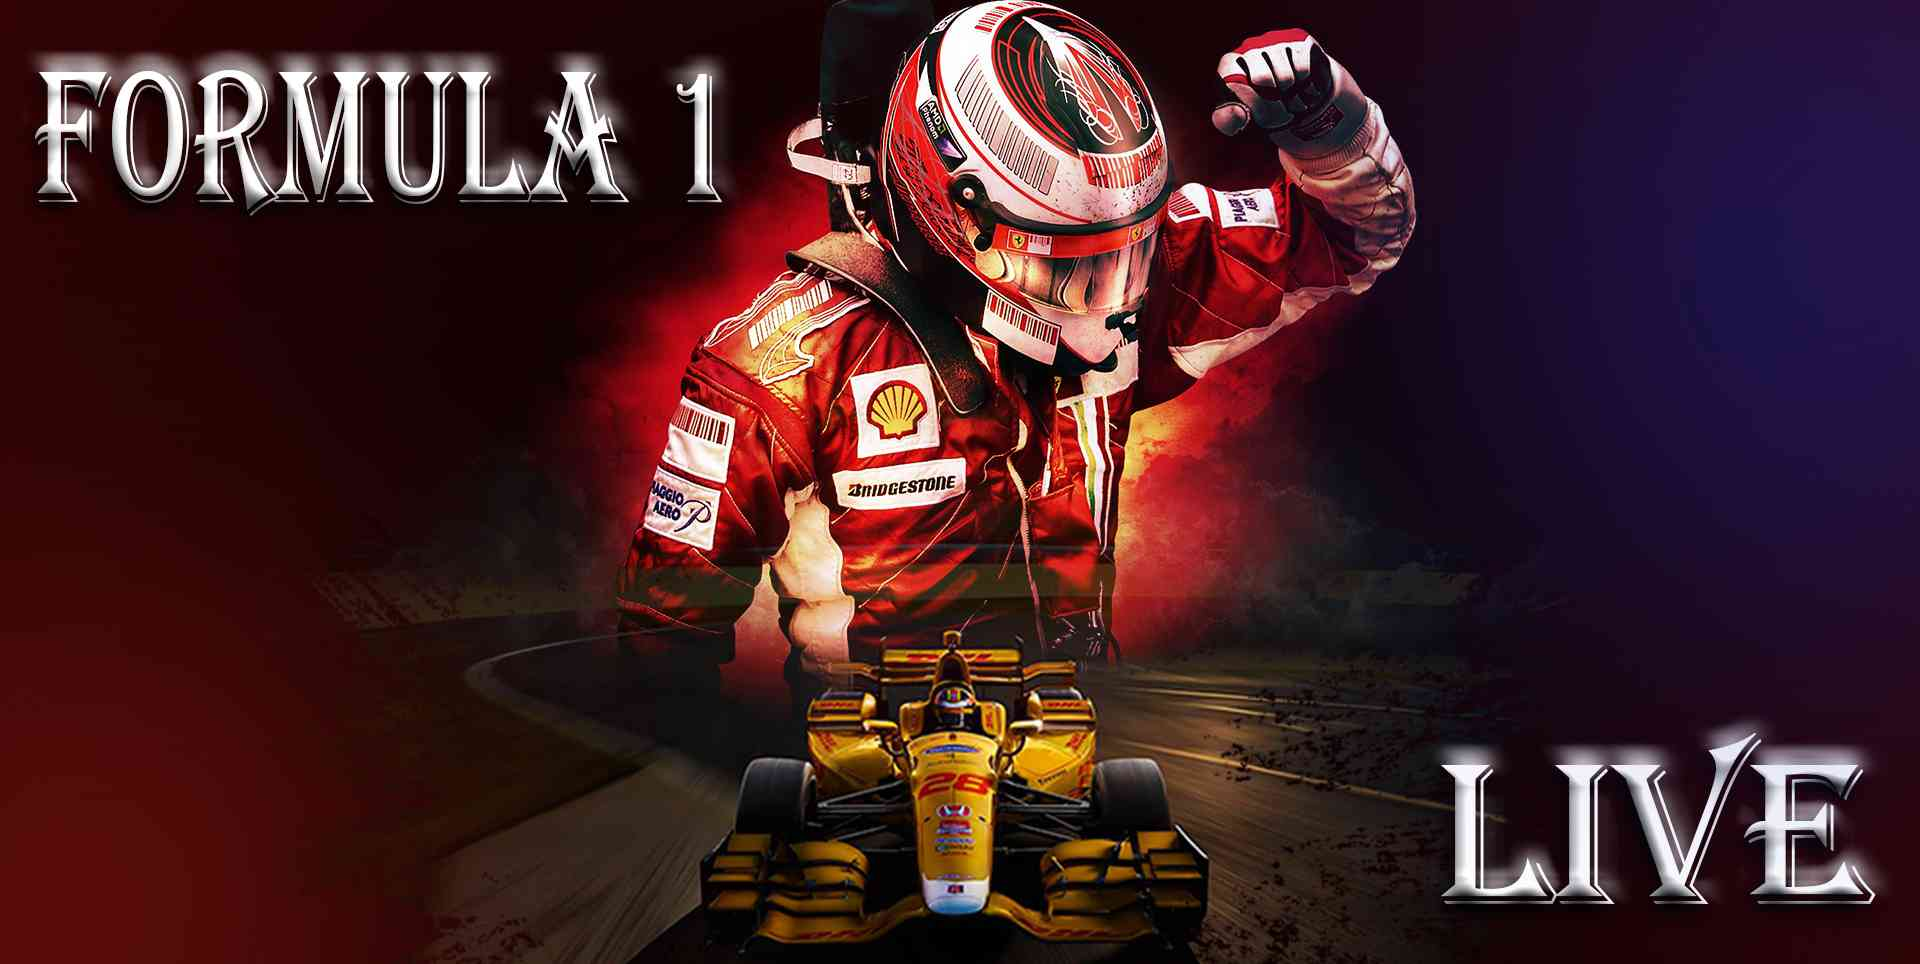 F1 Italian Grand Prix 2018 Live